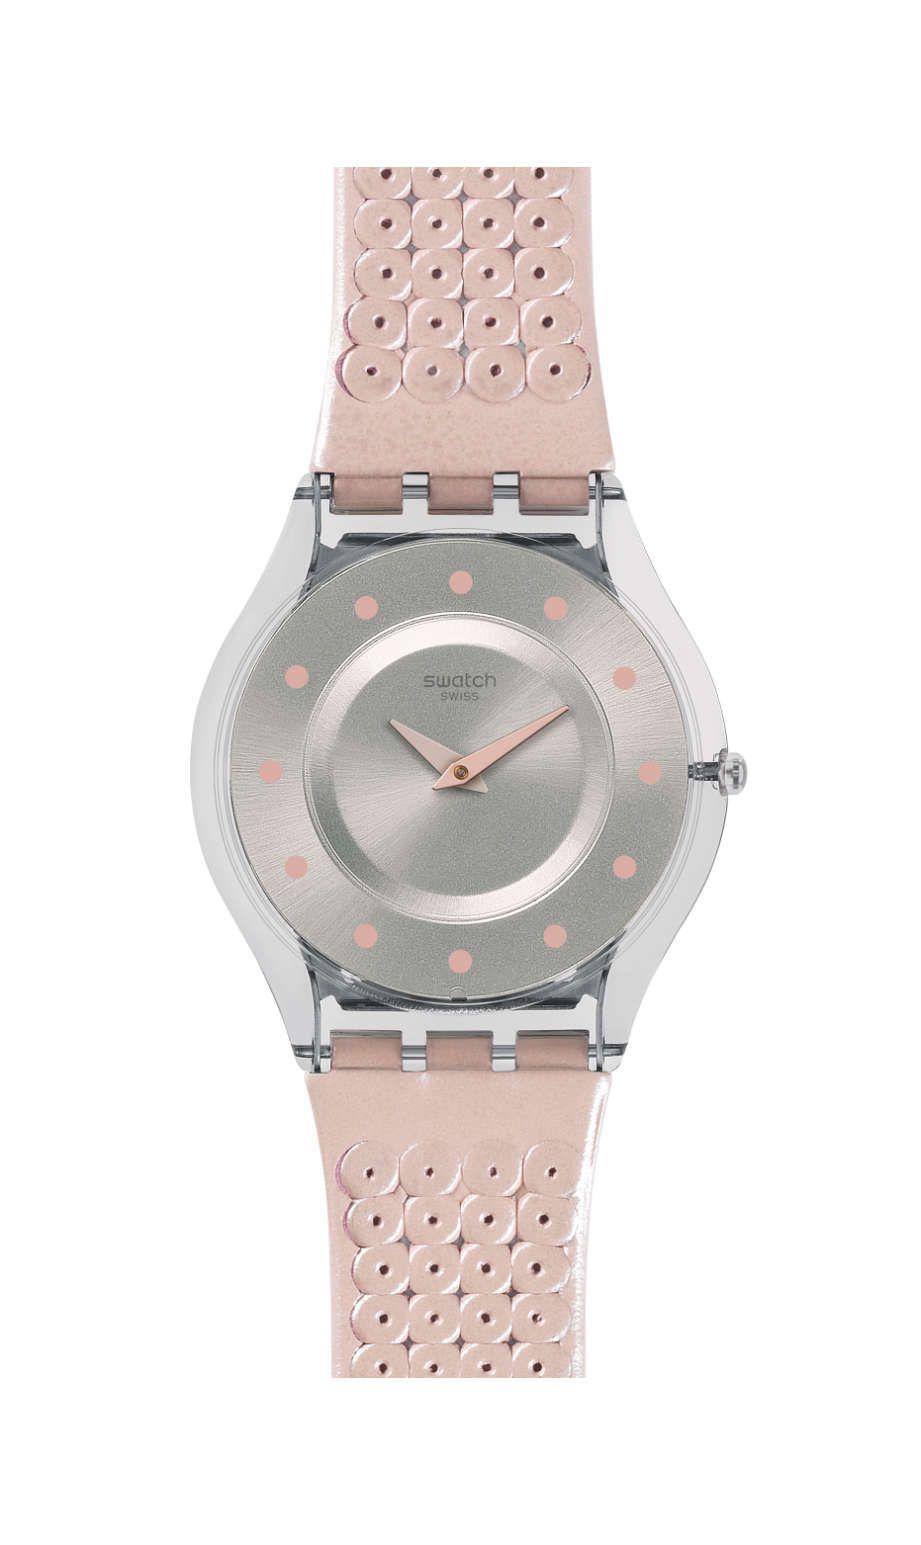 Cipria Swatch Watch Swatch Watches Reloj Joyas Tous Y